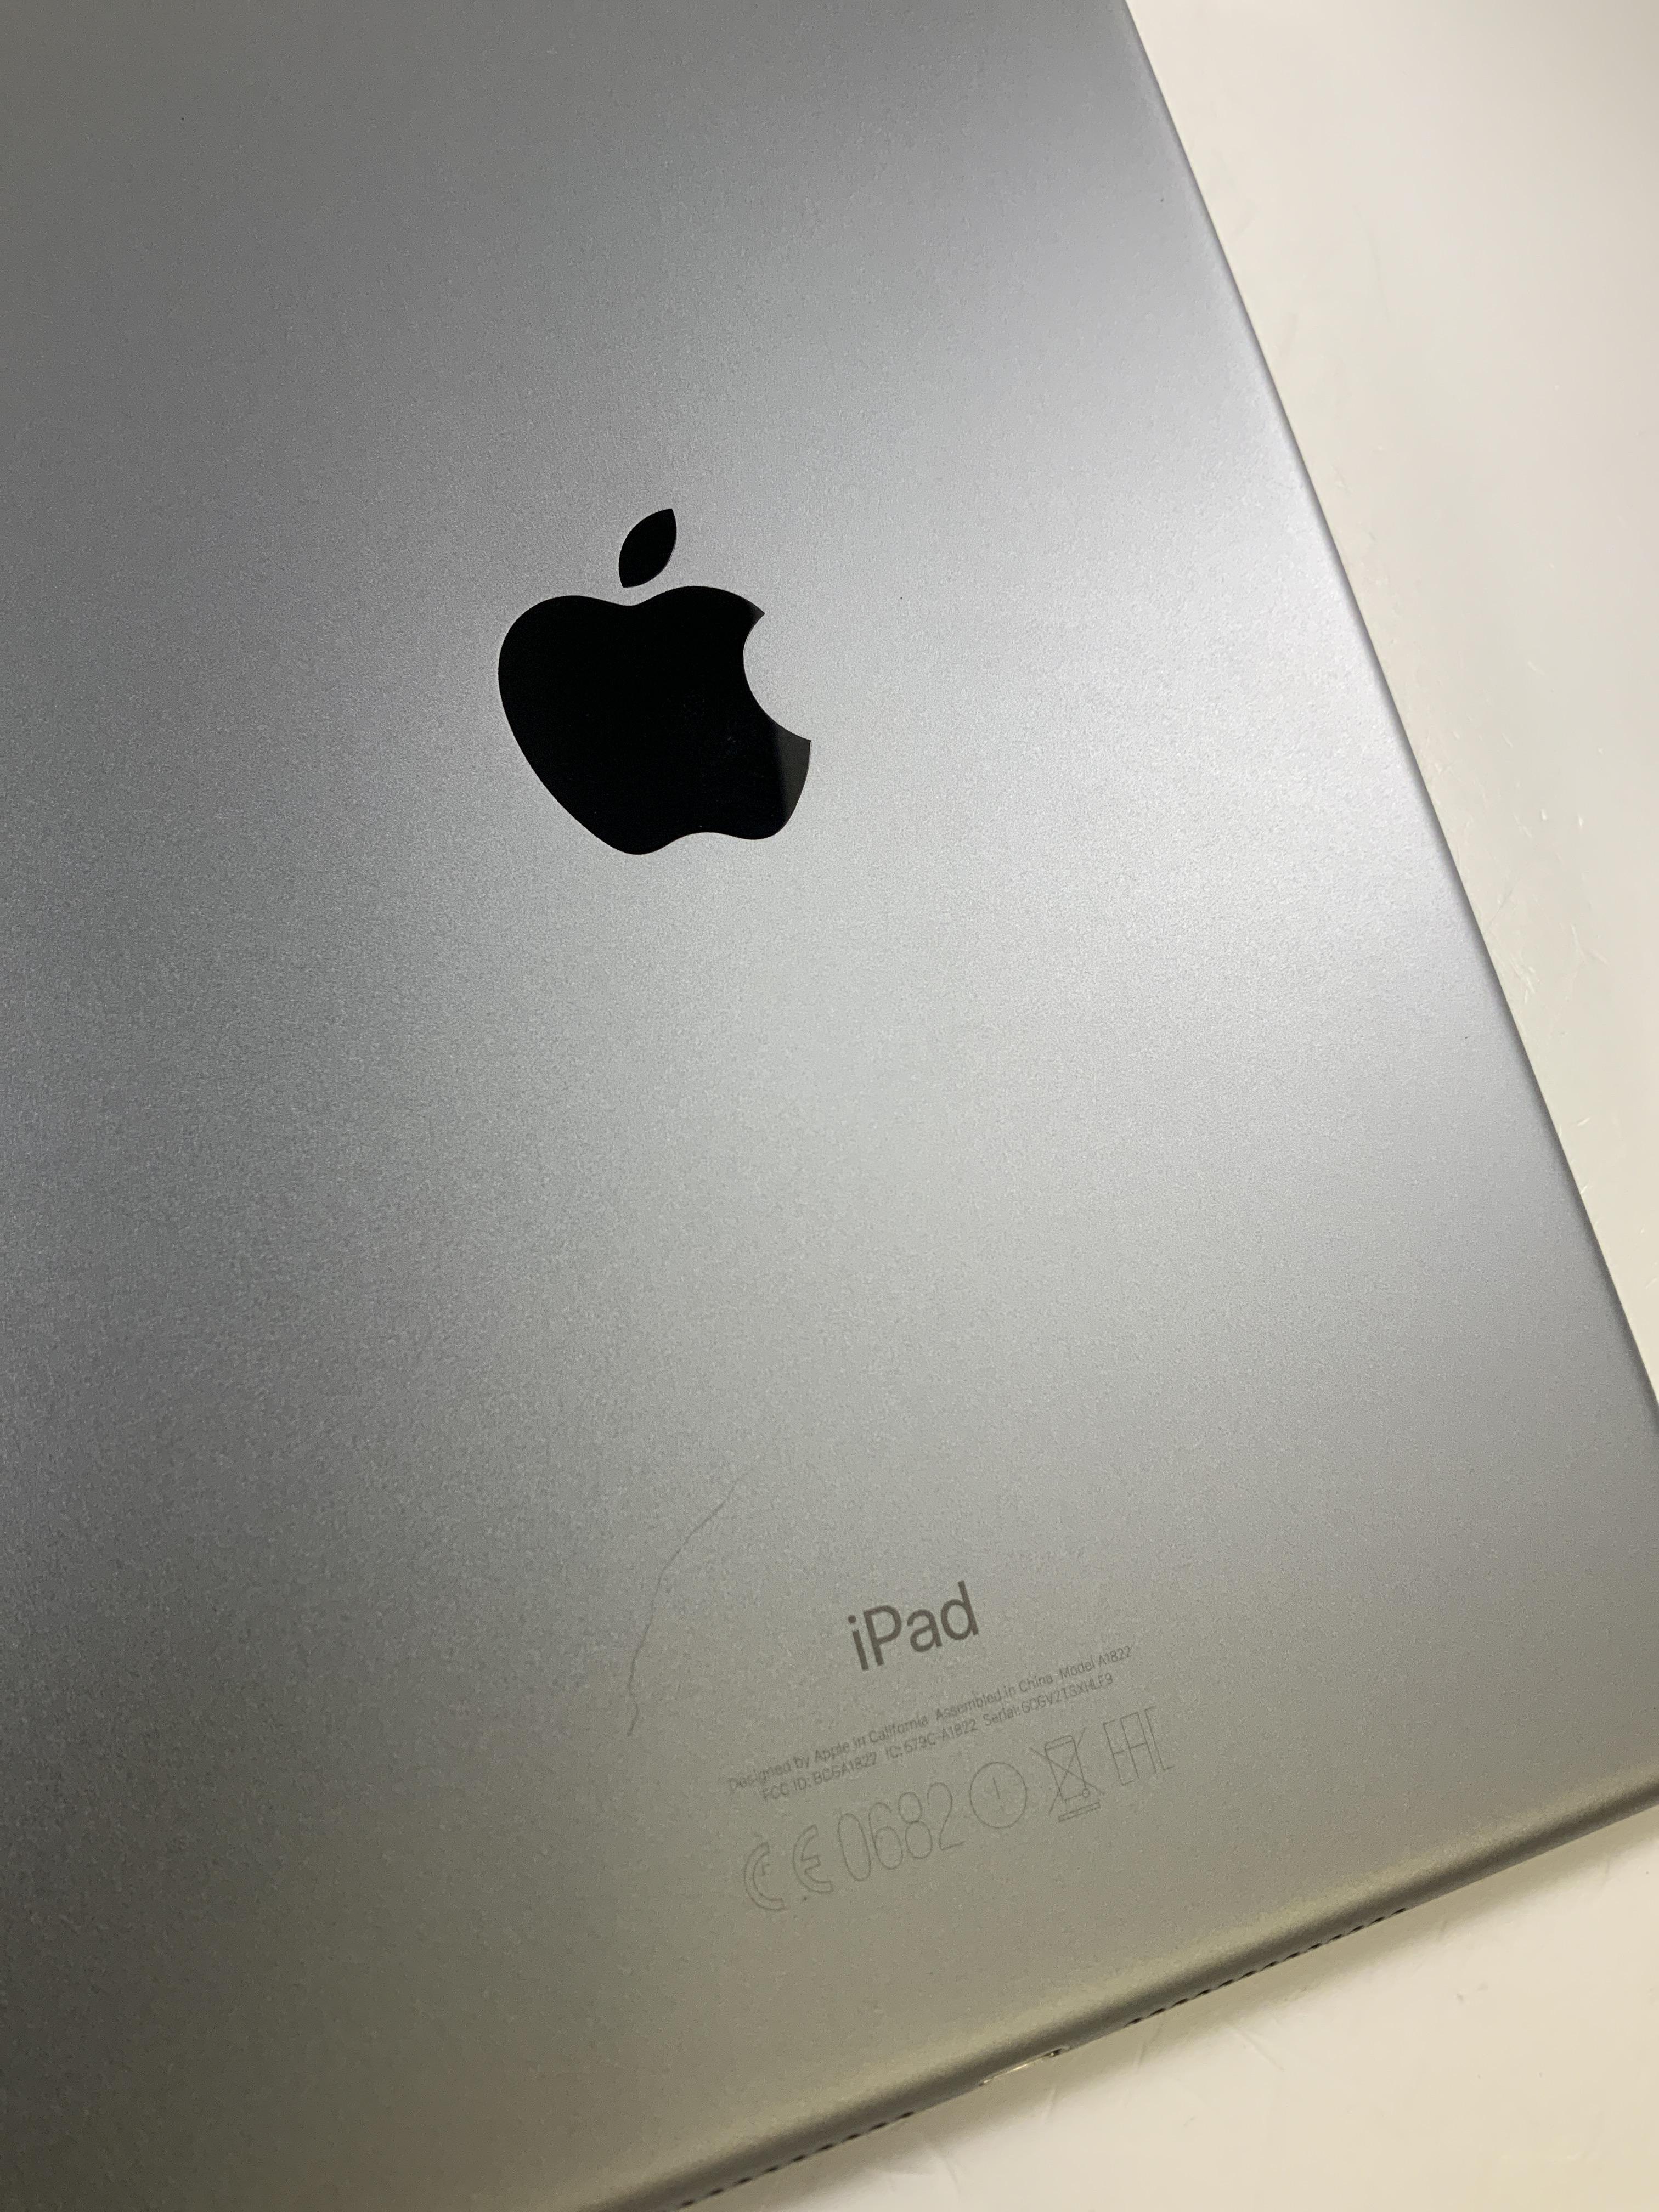 iPad 5 Wi-Fi 32GB, 32GB, Space Gray, Bild 3